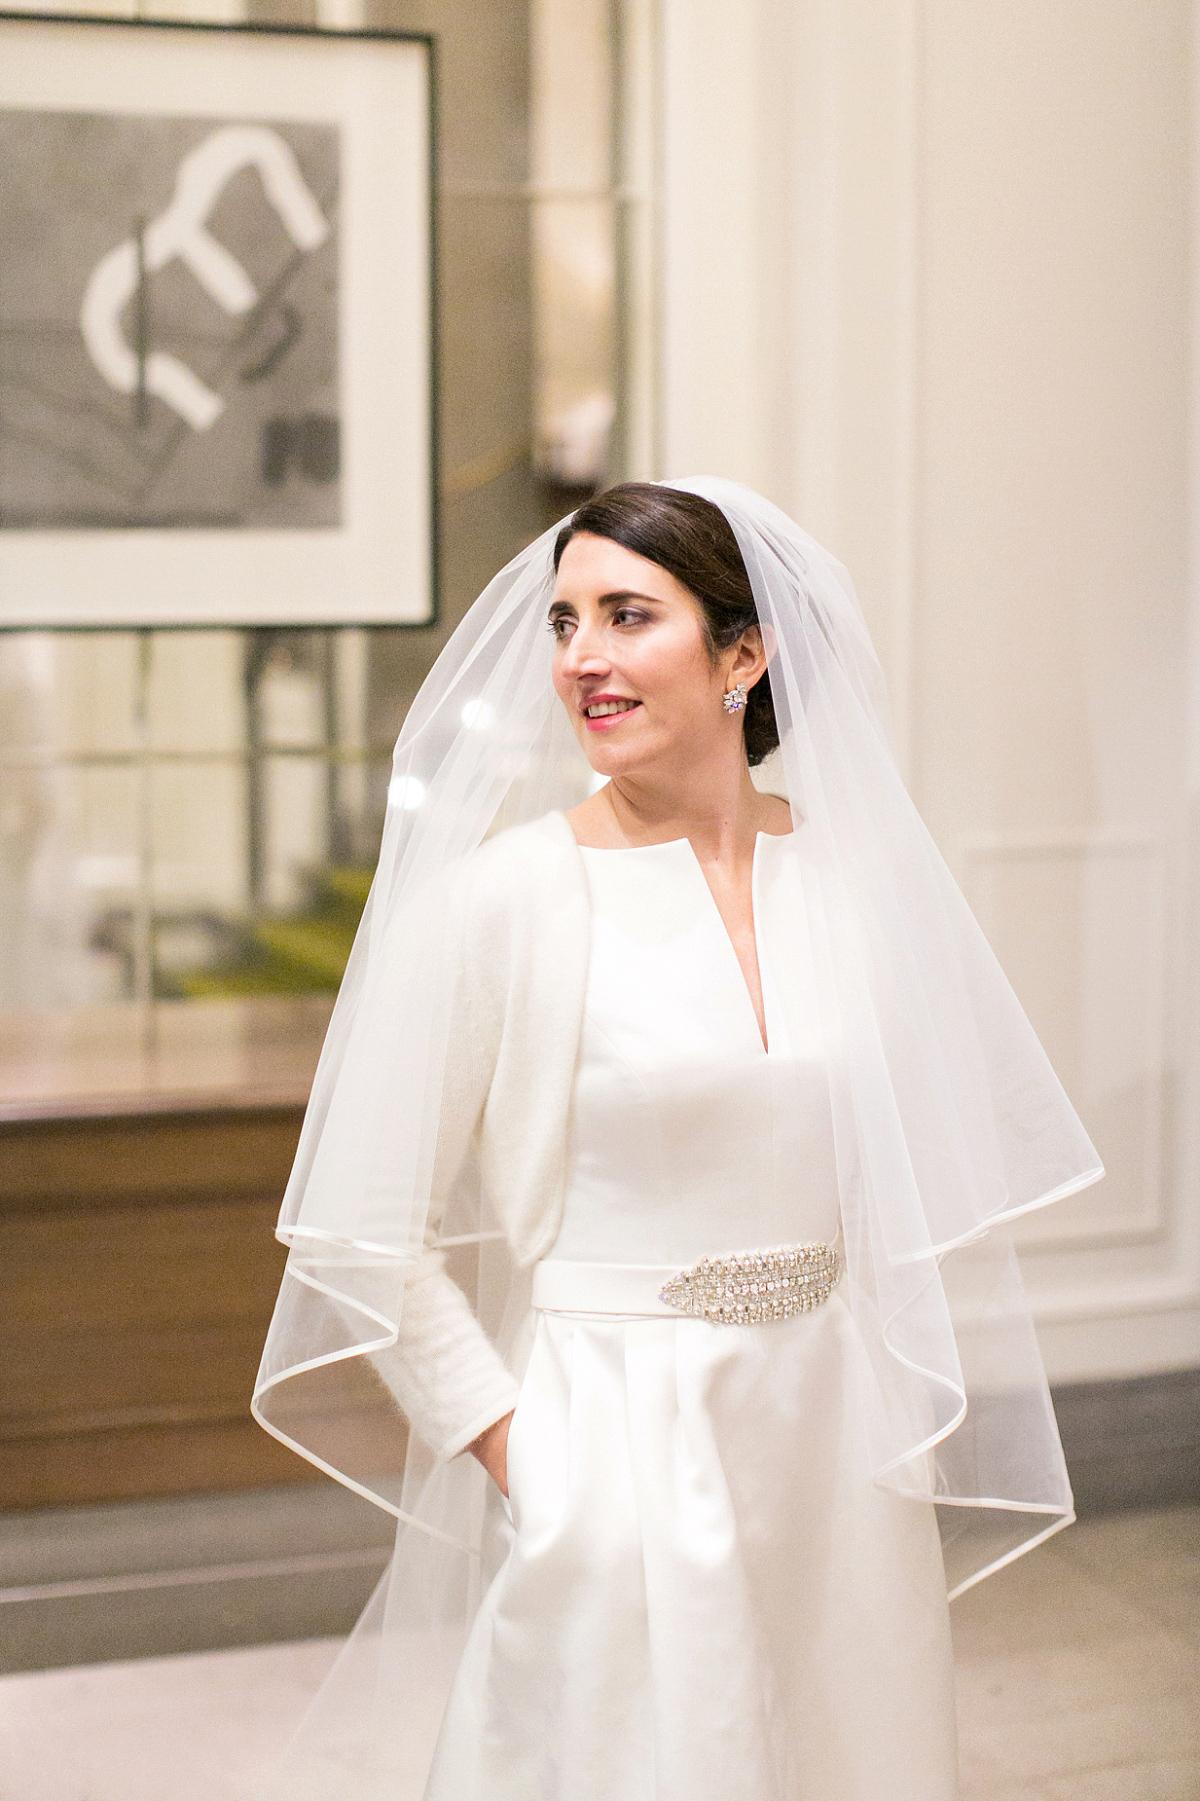 Modern Winter Wedding Dresses : Winter wedding in classic modern style love my dress? uk